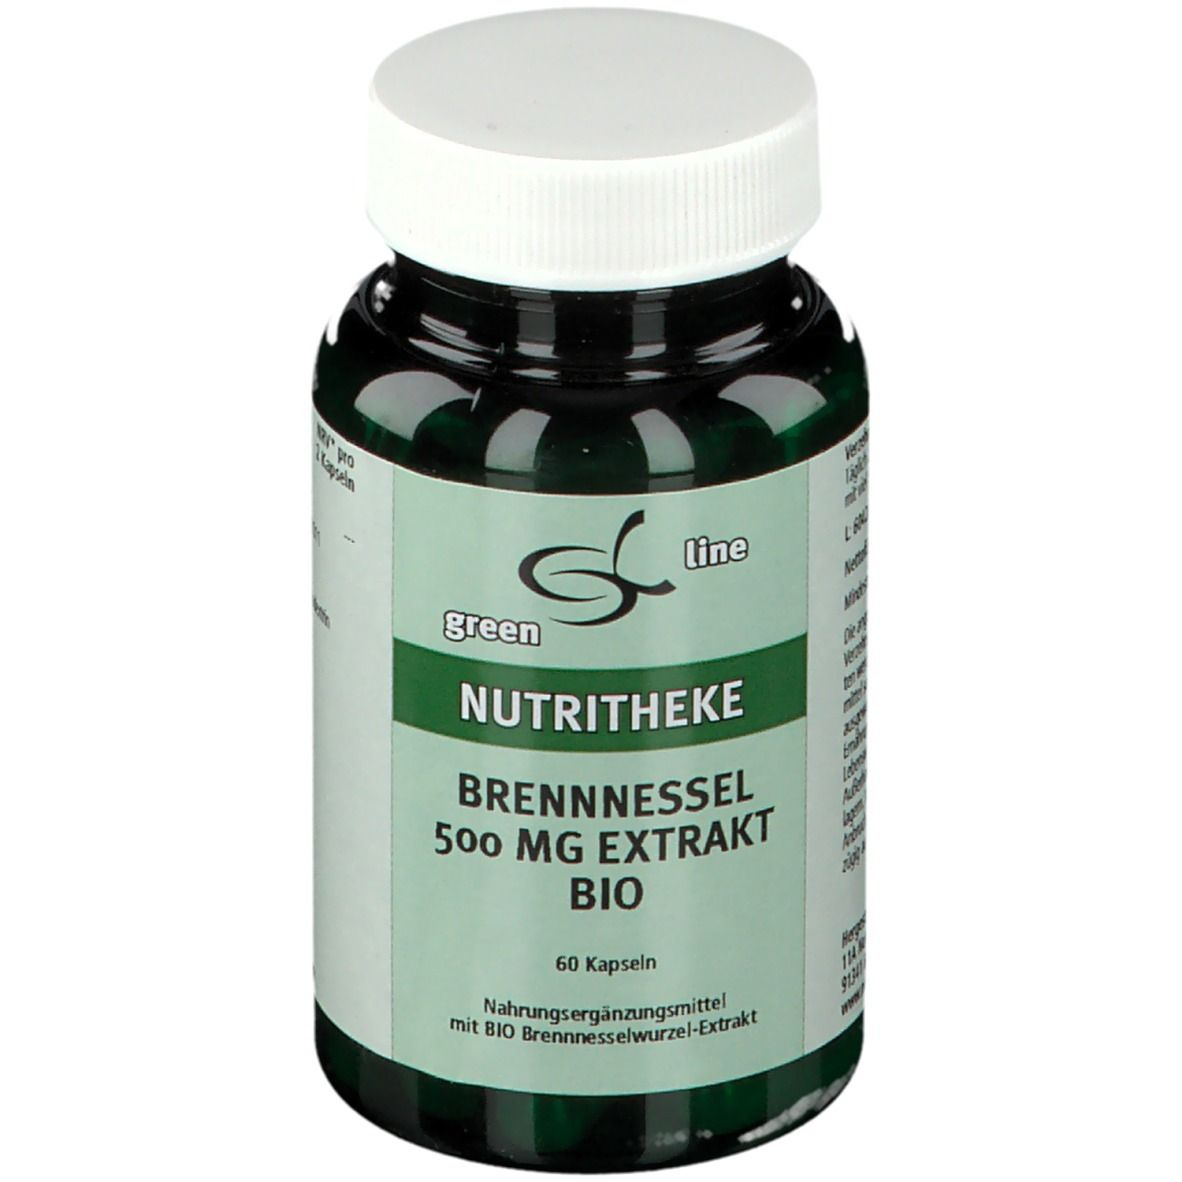 Image of green line BRENNESSEL 500 mg EXTRAKT BIO